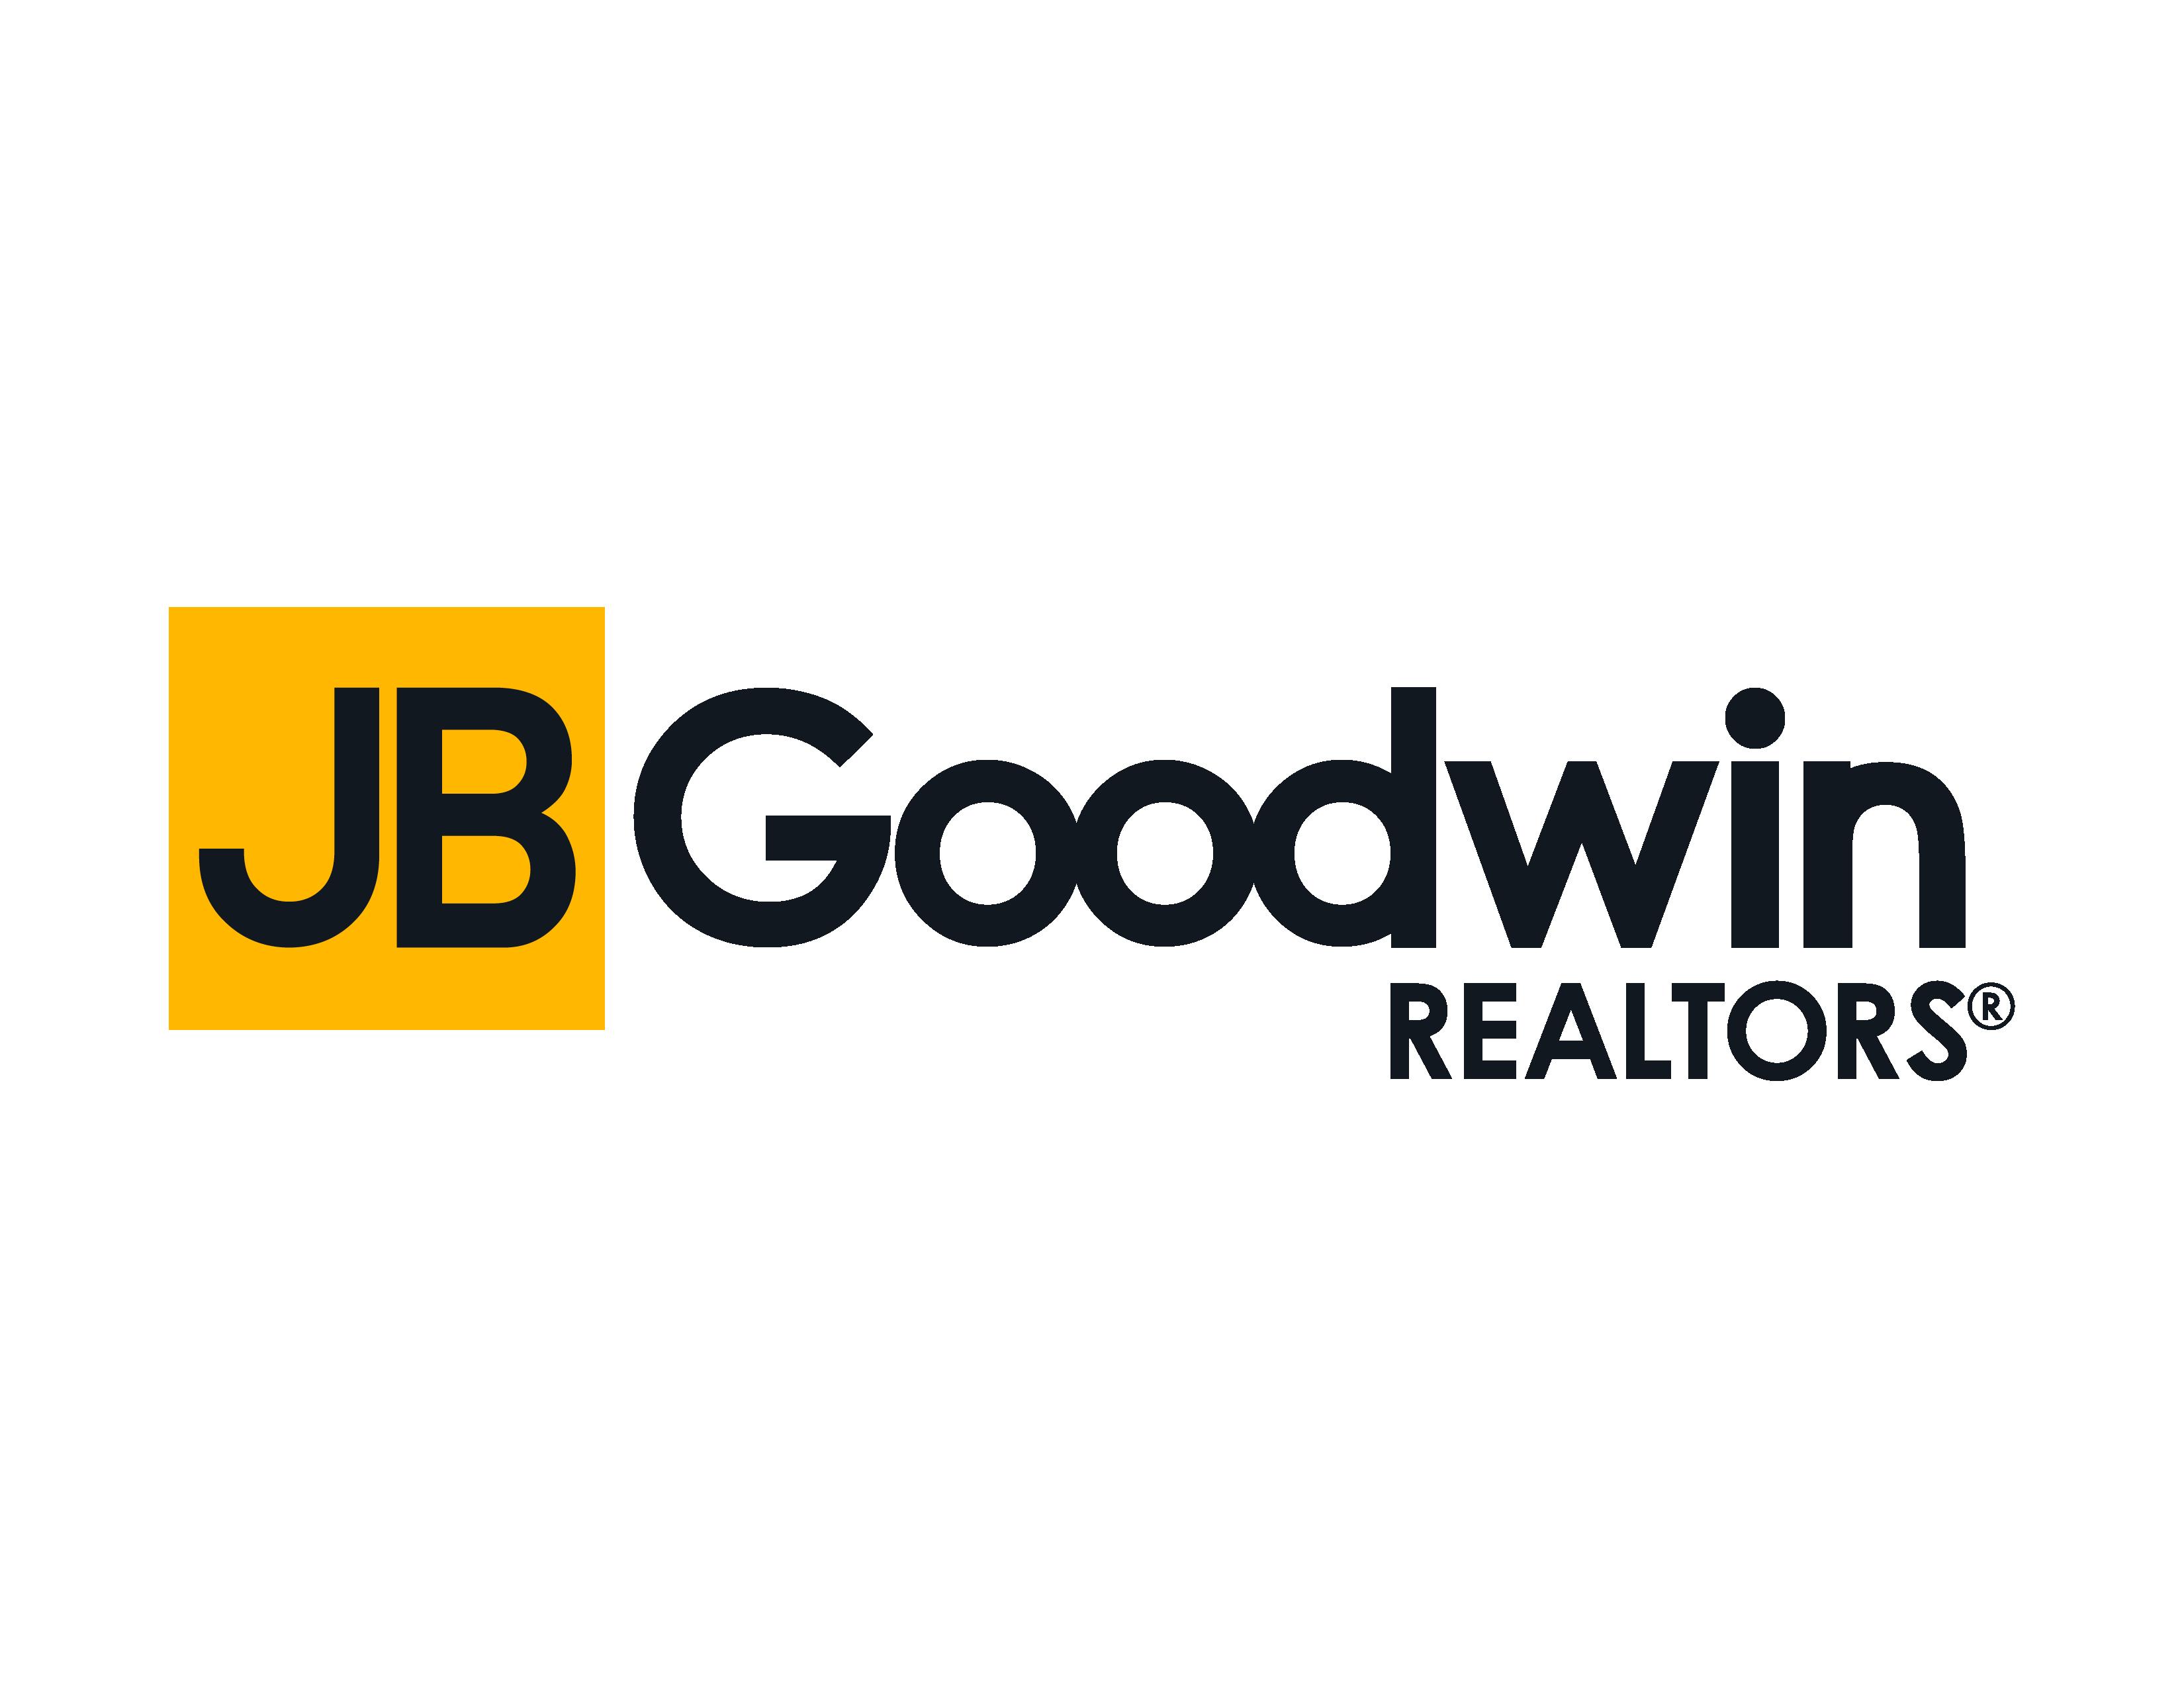 JBGoodwin, REALTORS logo